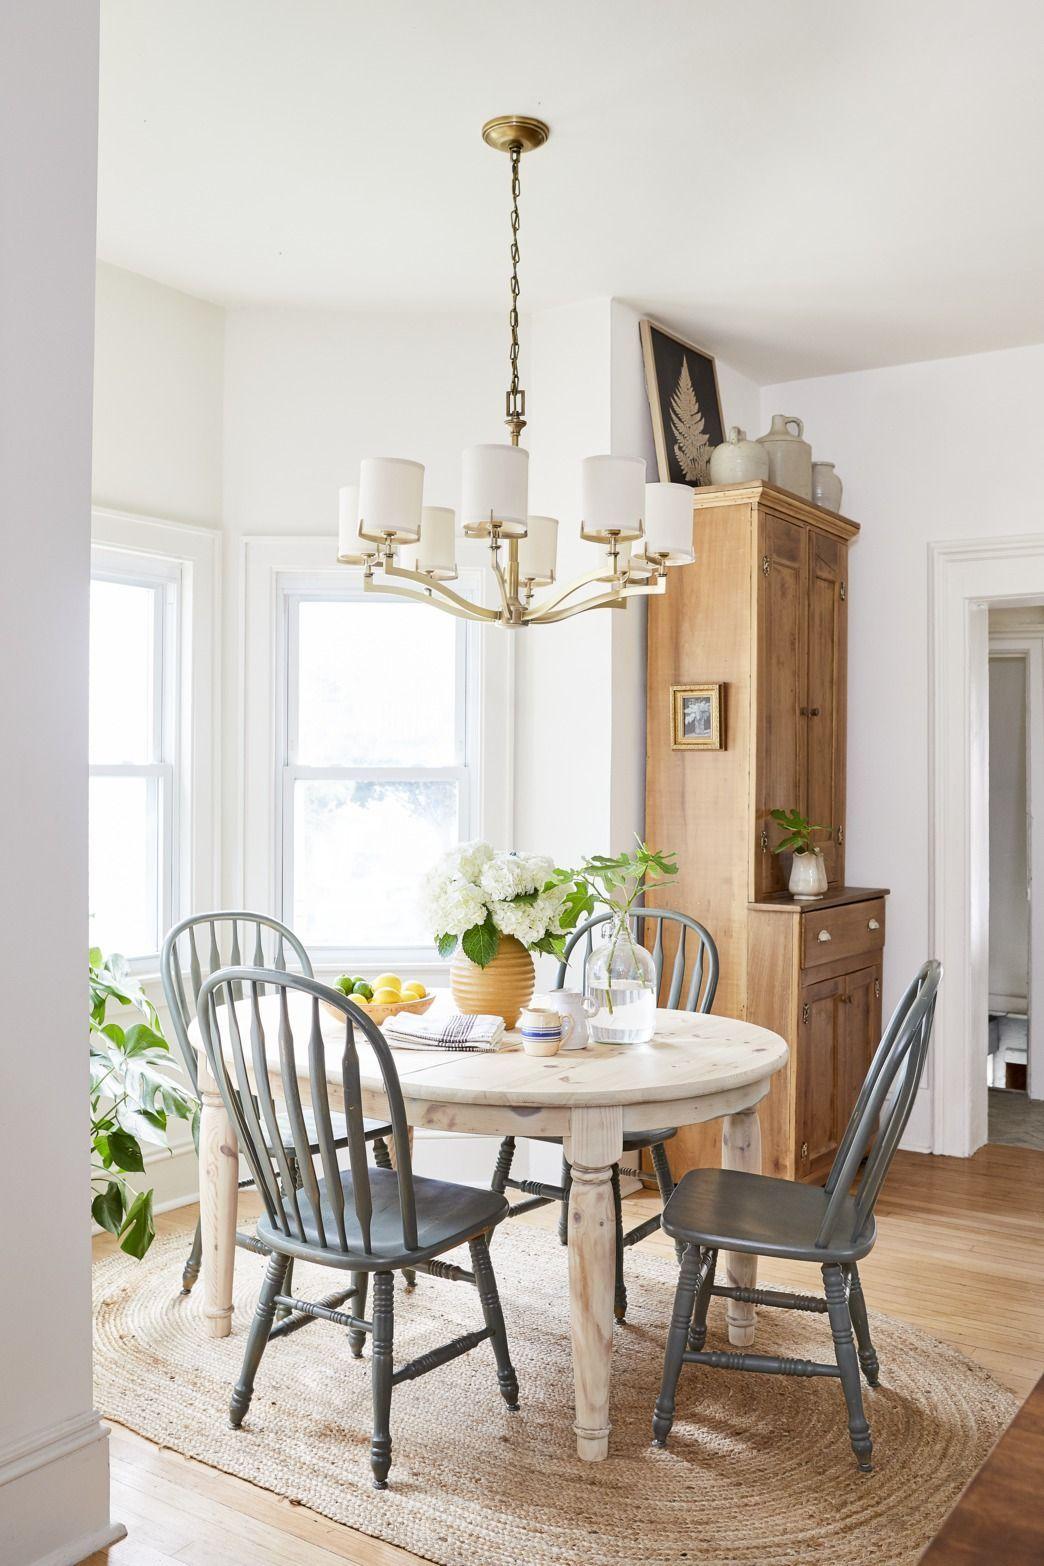 310 Dining Rooms Ideas House Design Room Decor